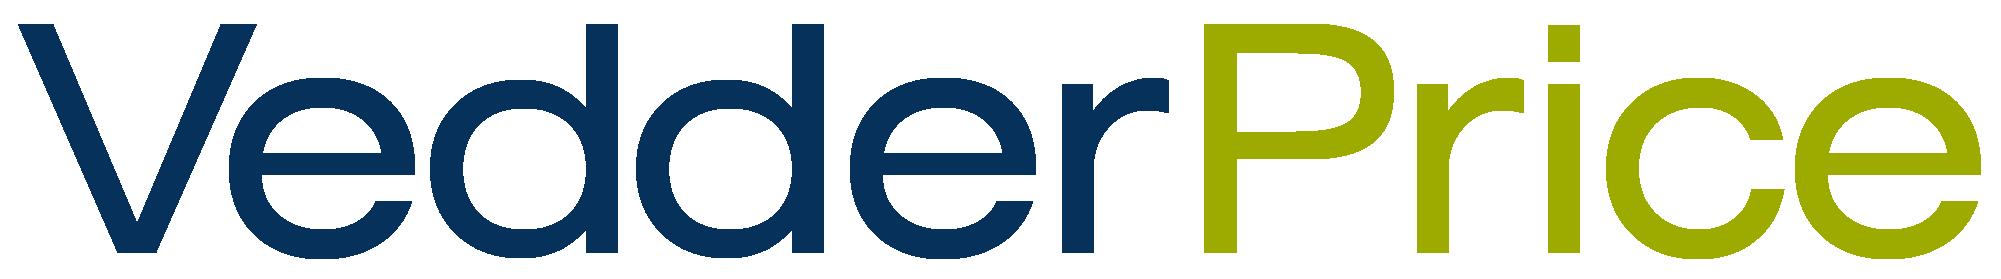 Logo of Vedder Price